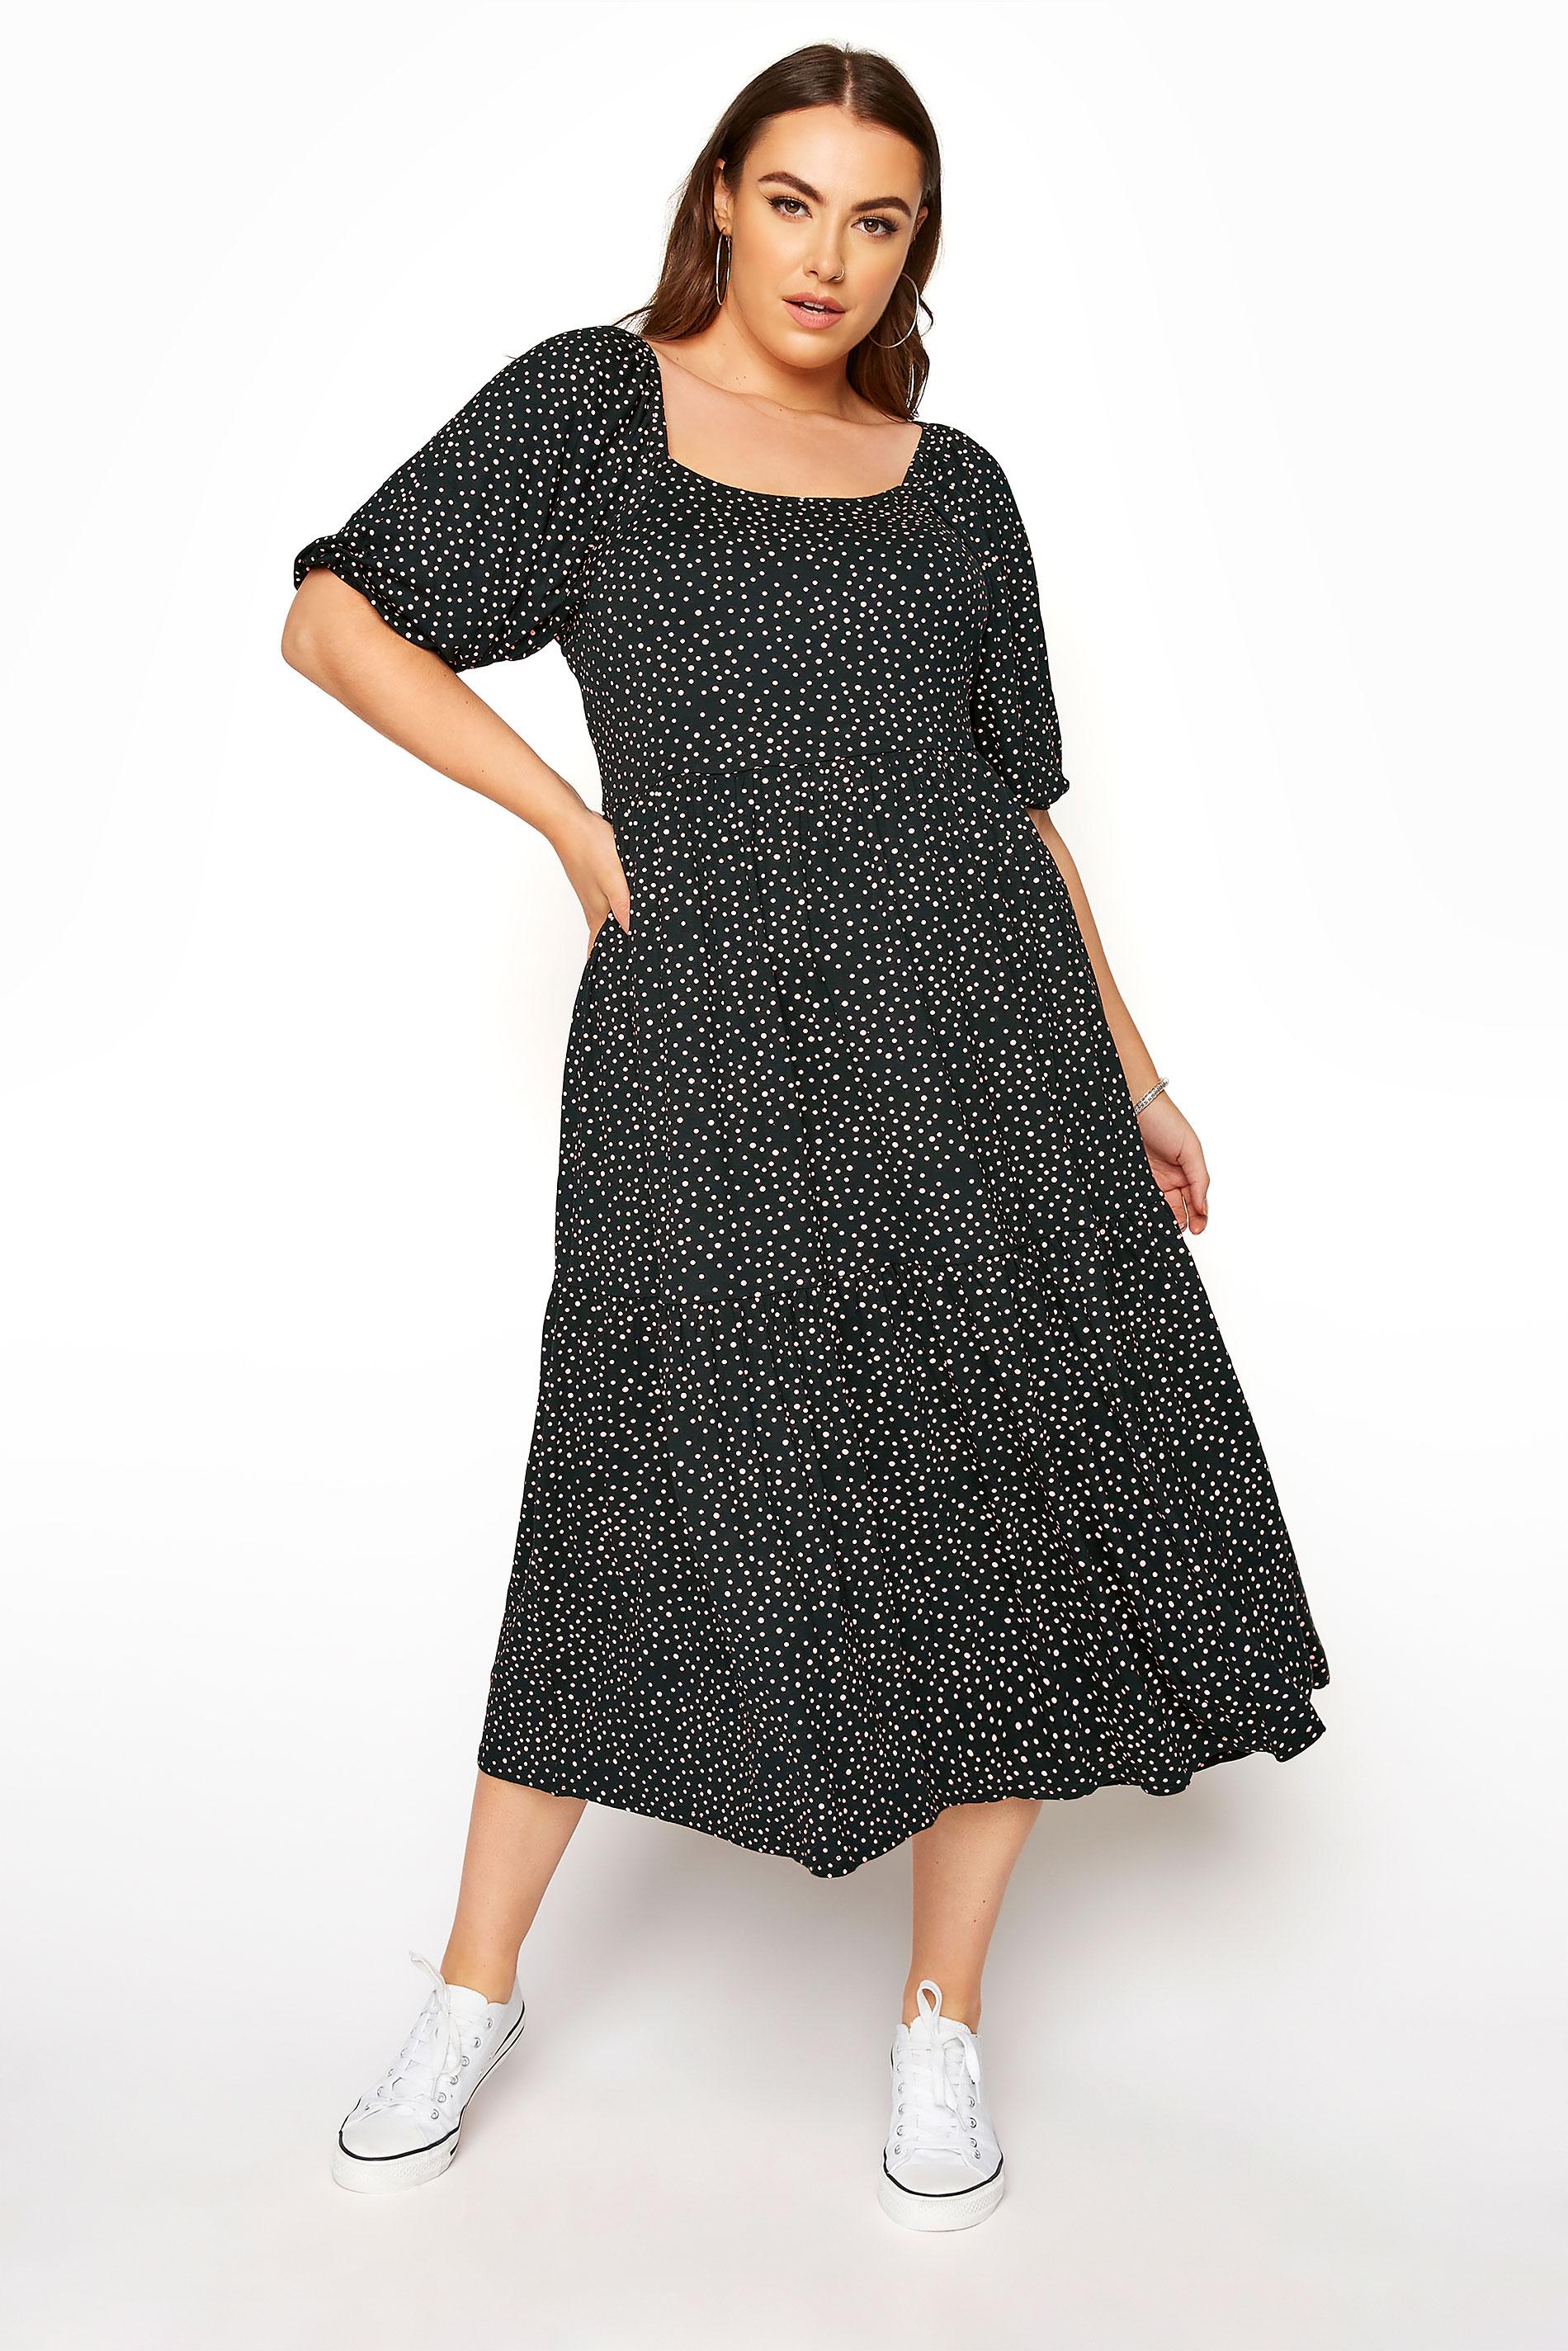 Black Polka Dot Square Neck Midaxi Dress_A.jpg